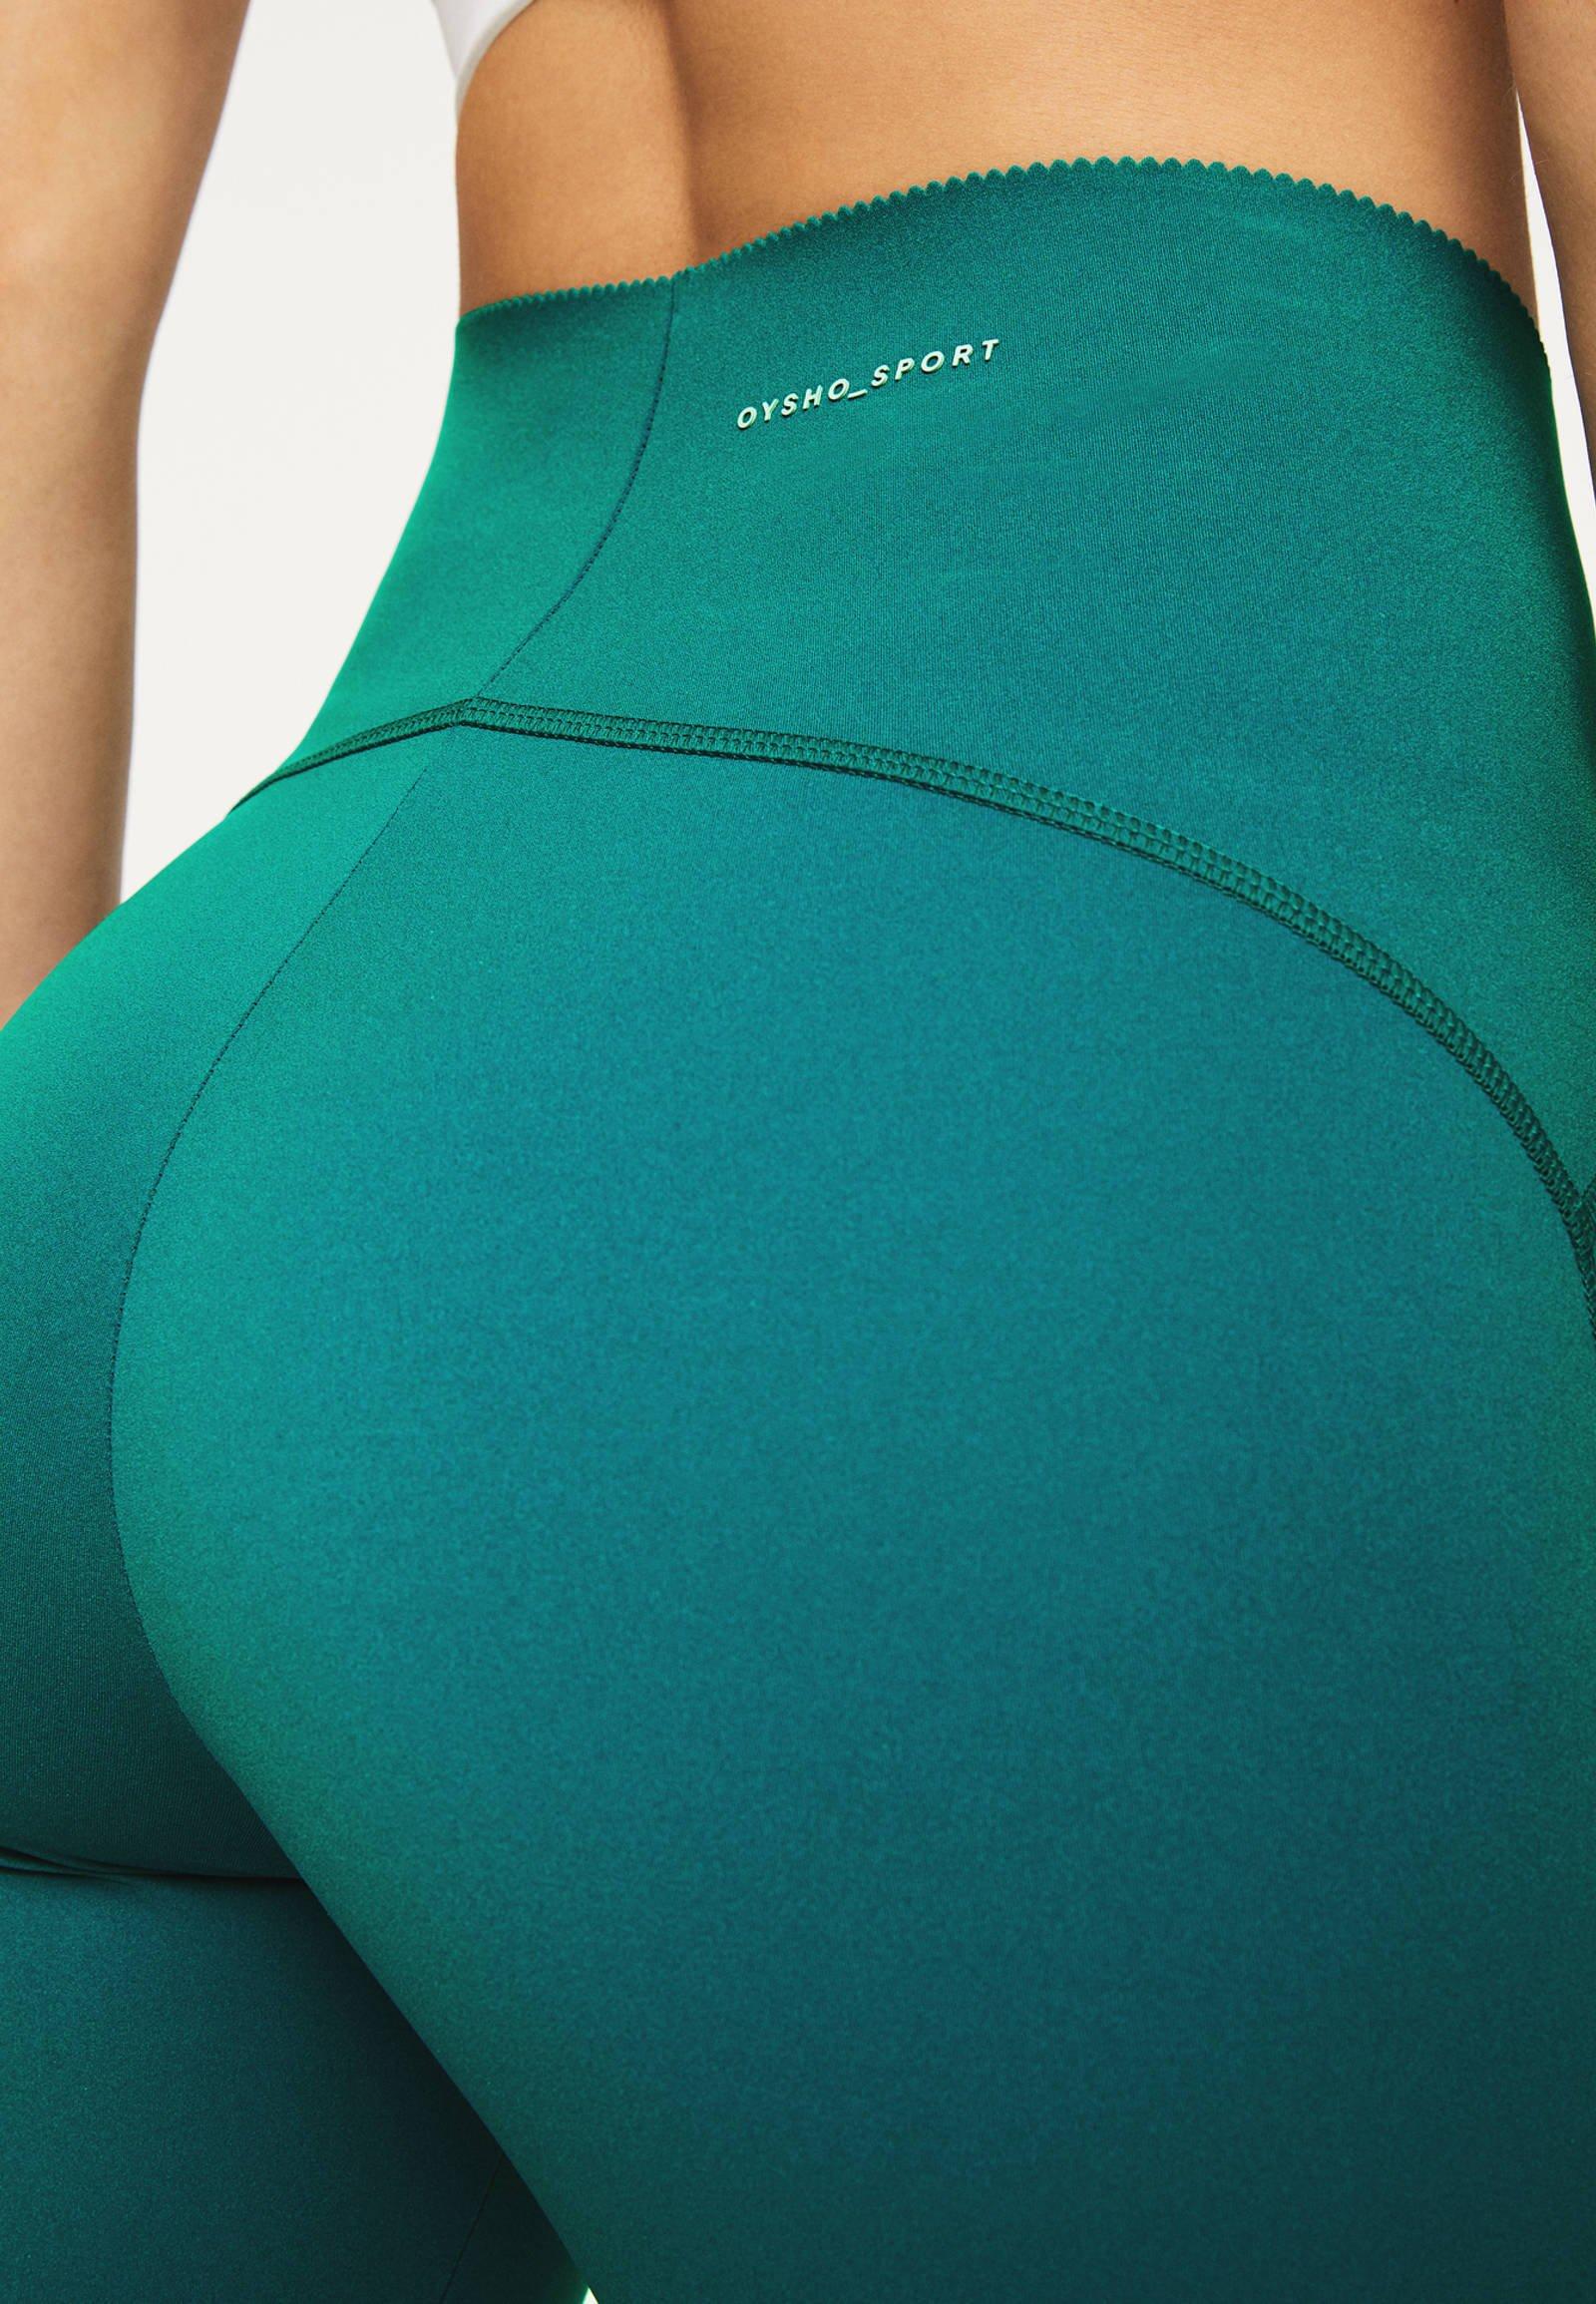 OYSHO Leggings - turquoise bxnJr